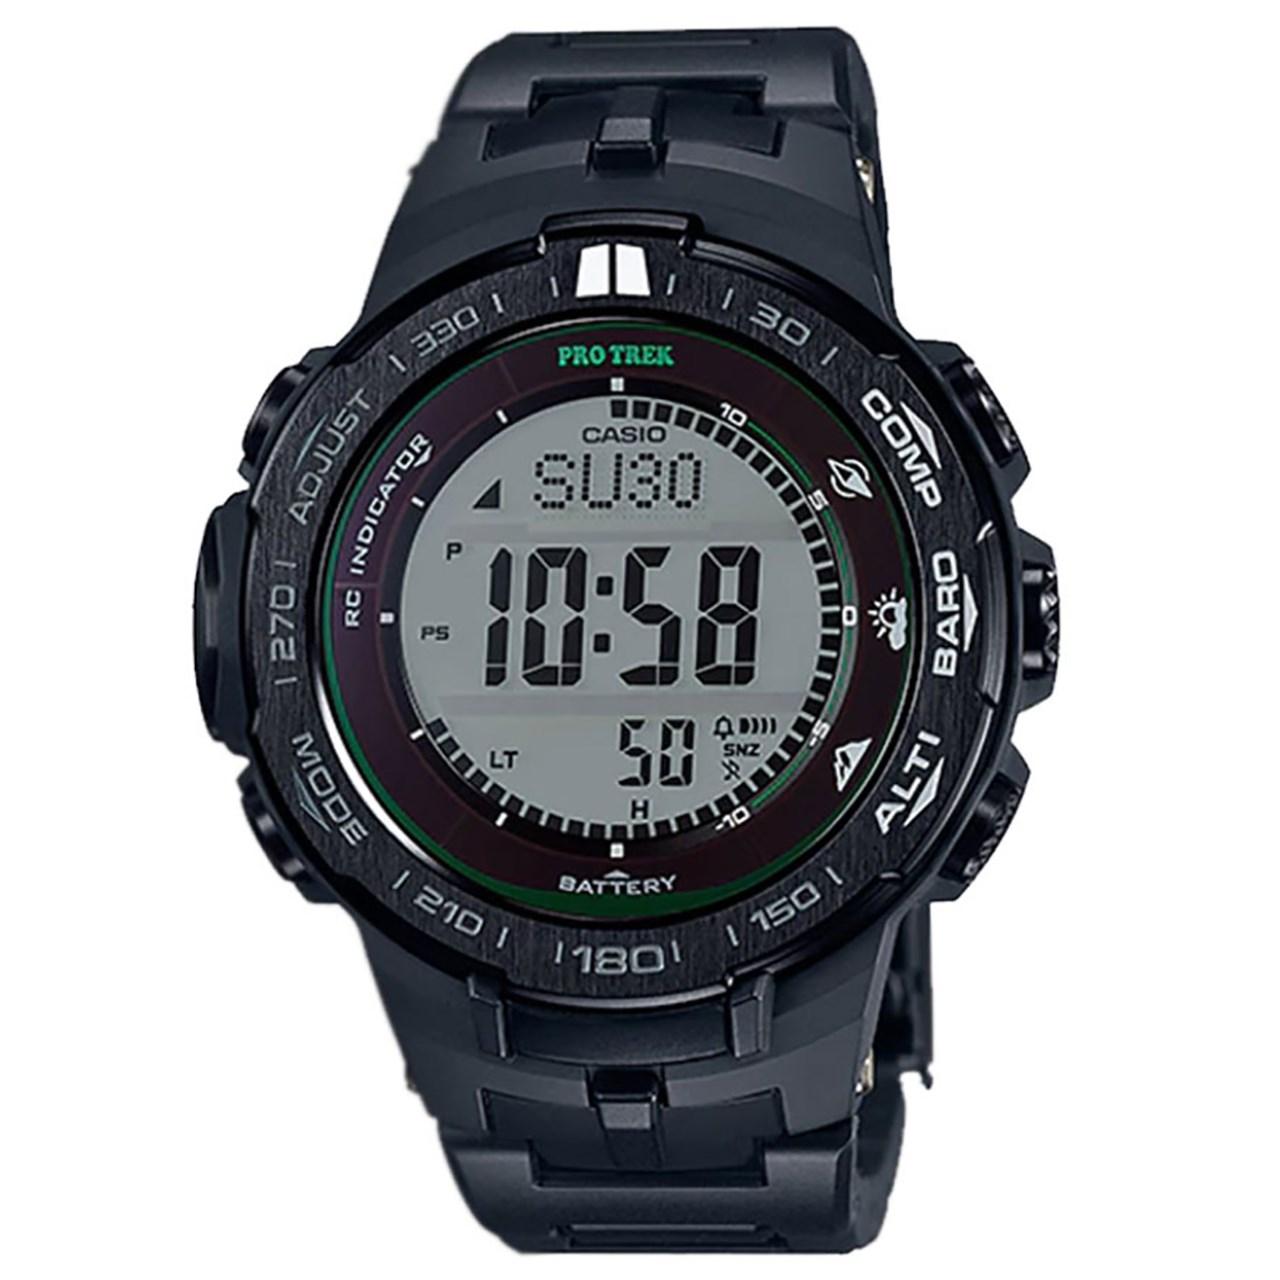 ساعت مچی دیجیتالی  مردانه  کاسیو پروترک مدل PRW-3100FC-1DR 35